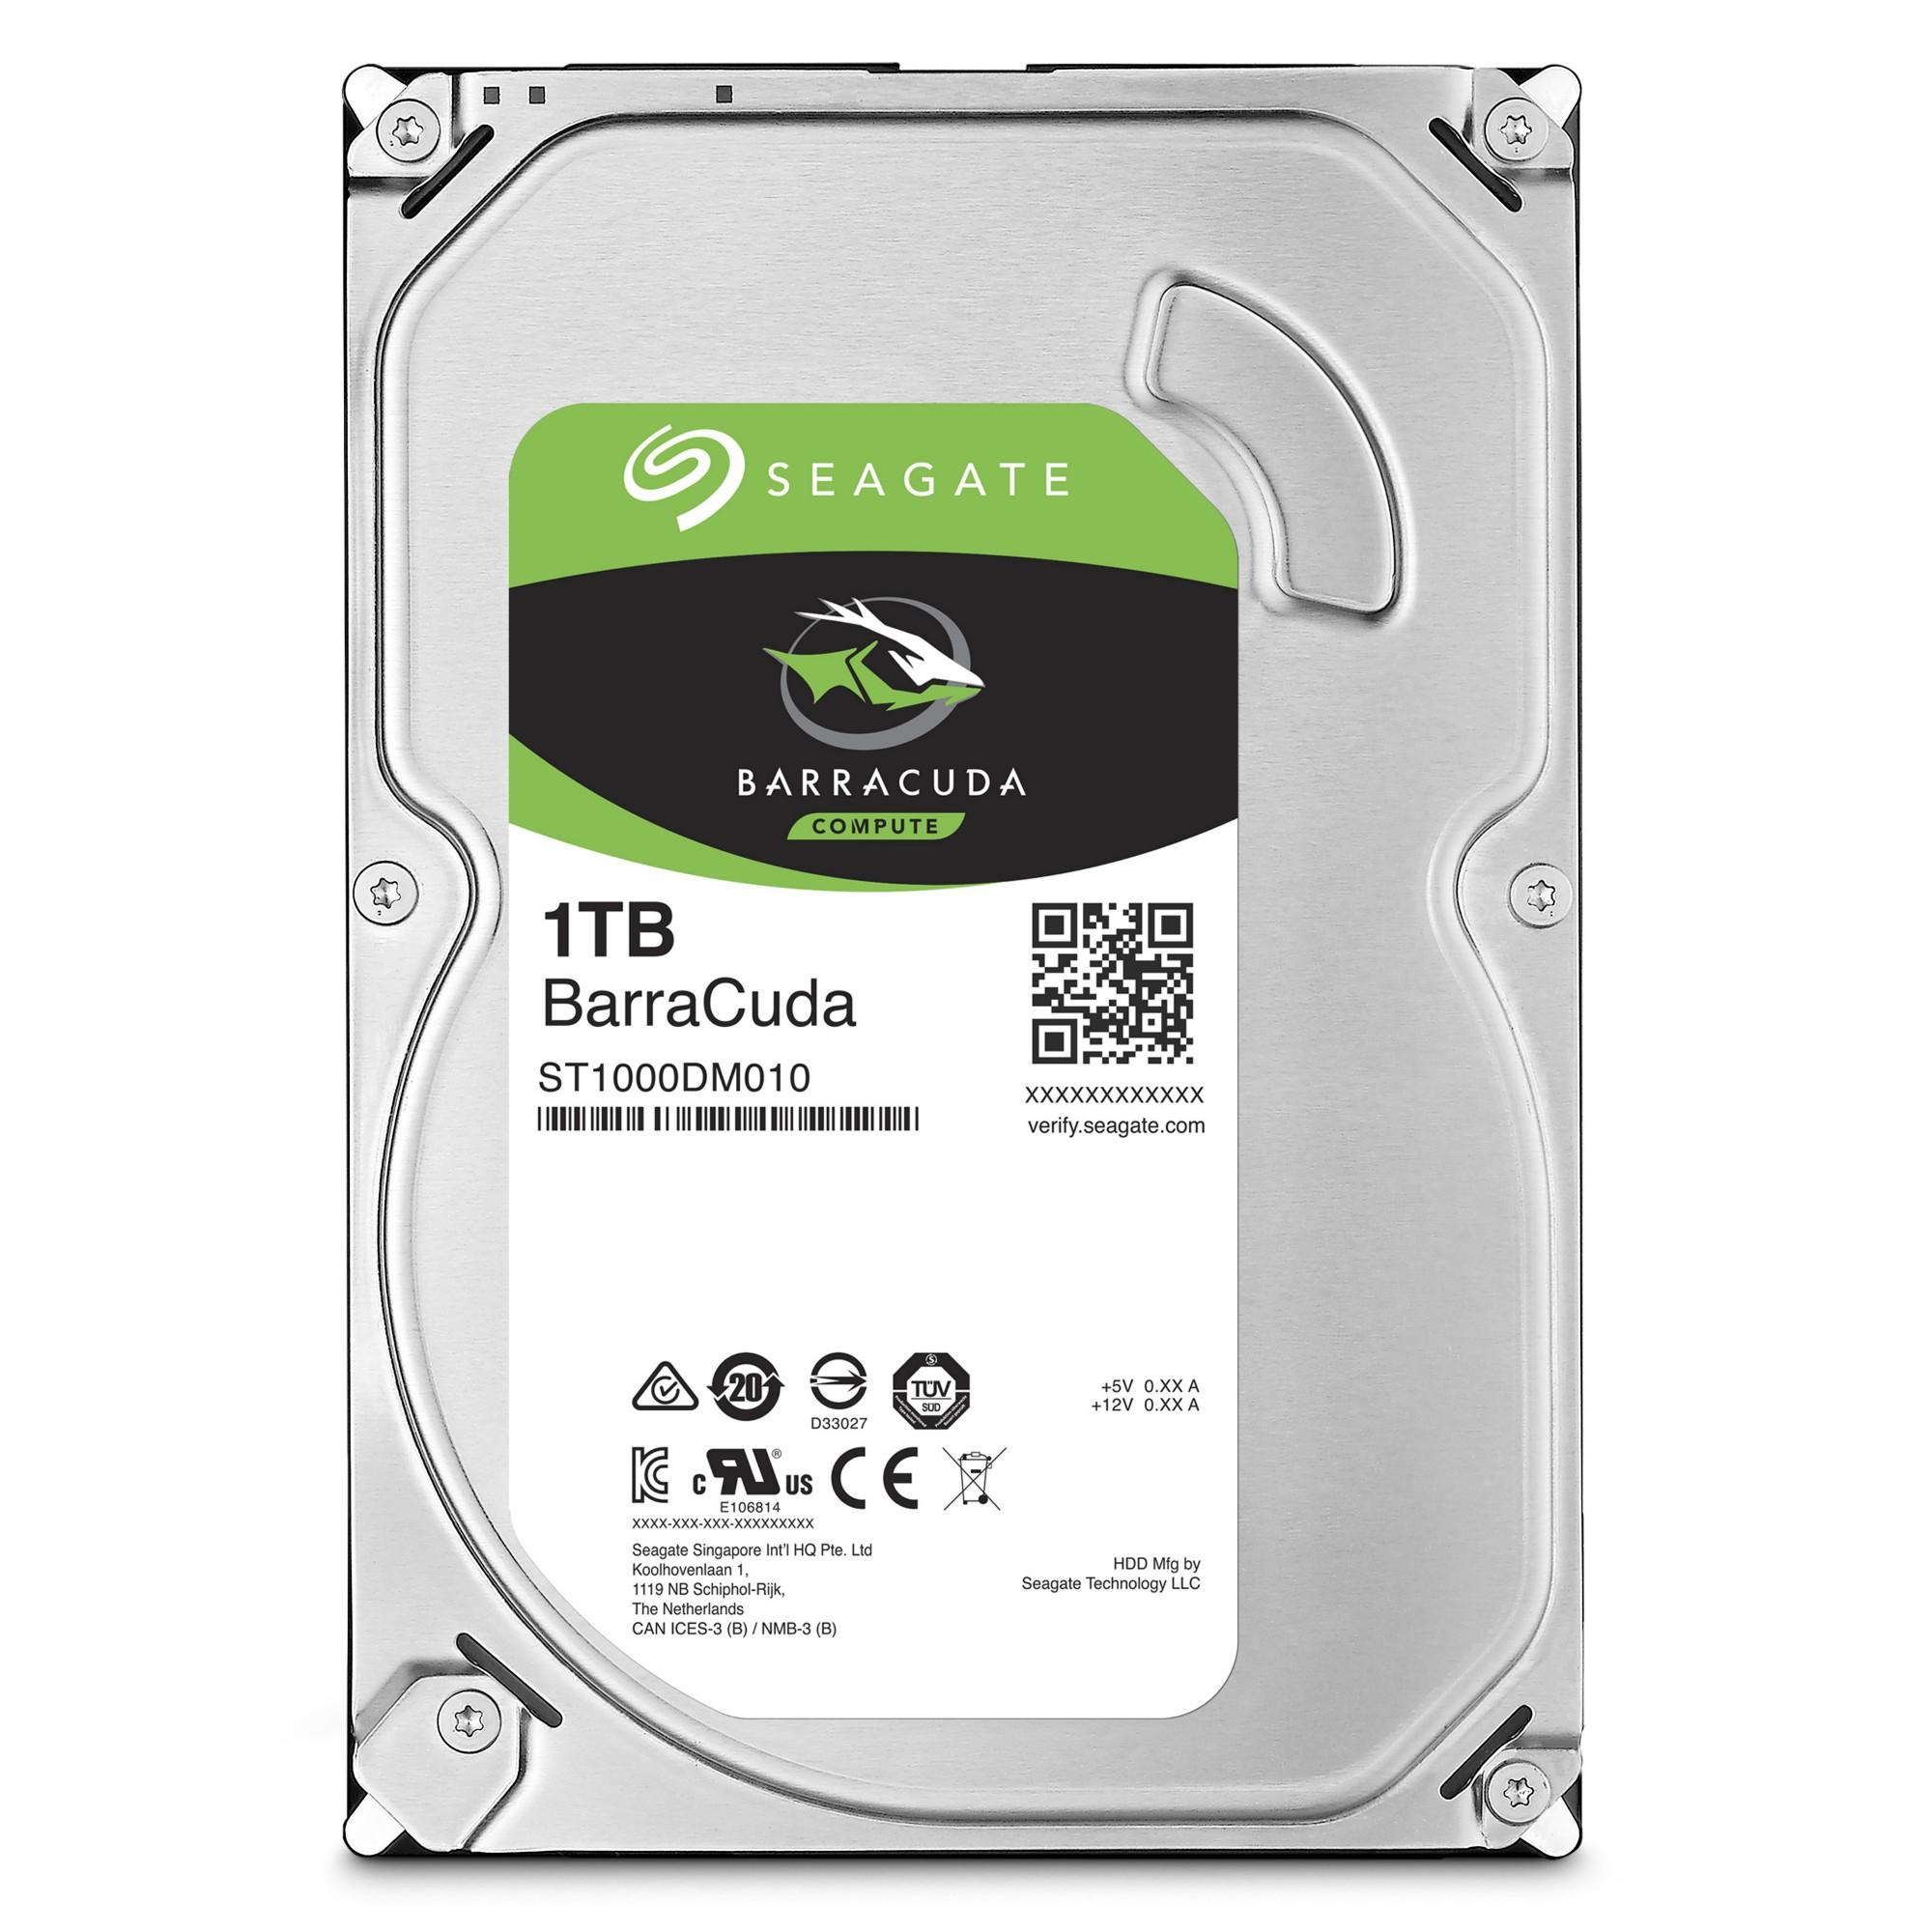 Seagate Barracuda 1000GB Serial ATA III internal hard drive